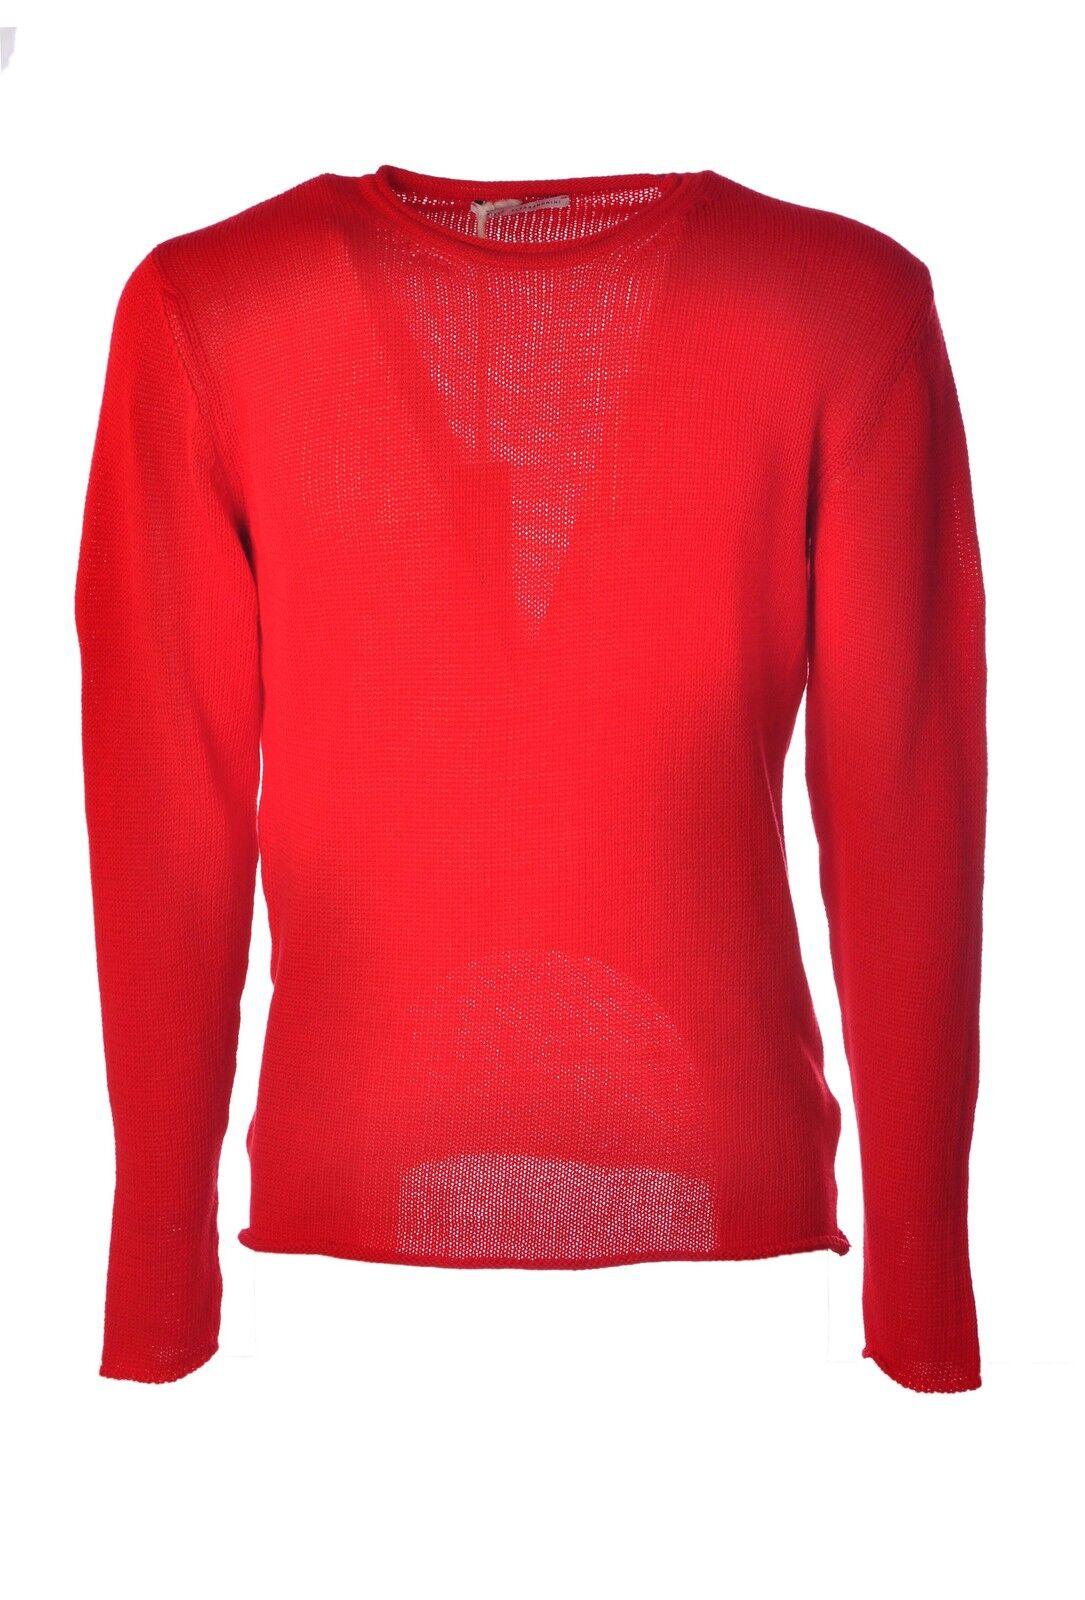 Daniele Alessandrini  -  Sweaters - Male - ROT - 3816429A181304